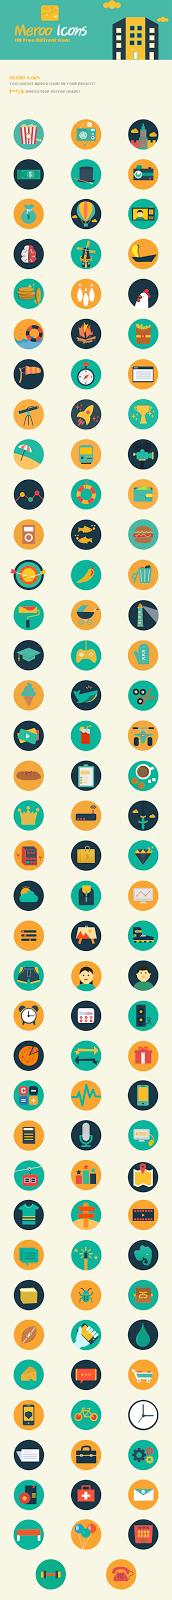 أيقونات ميرو لتصميم الفوتوشوب 2014 Meroo-Icons-Preview1.png